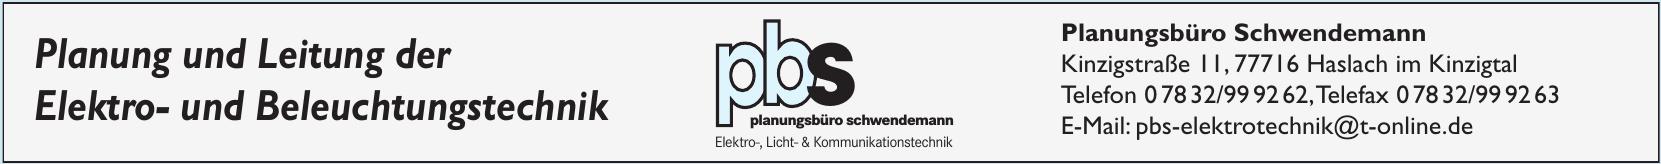 Planungsbüro Schwendemann